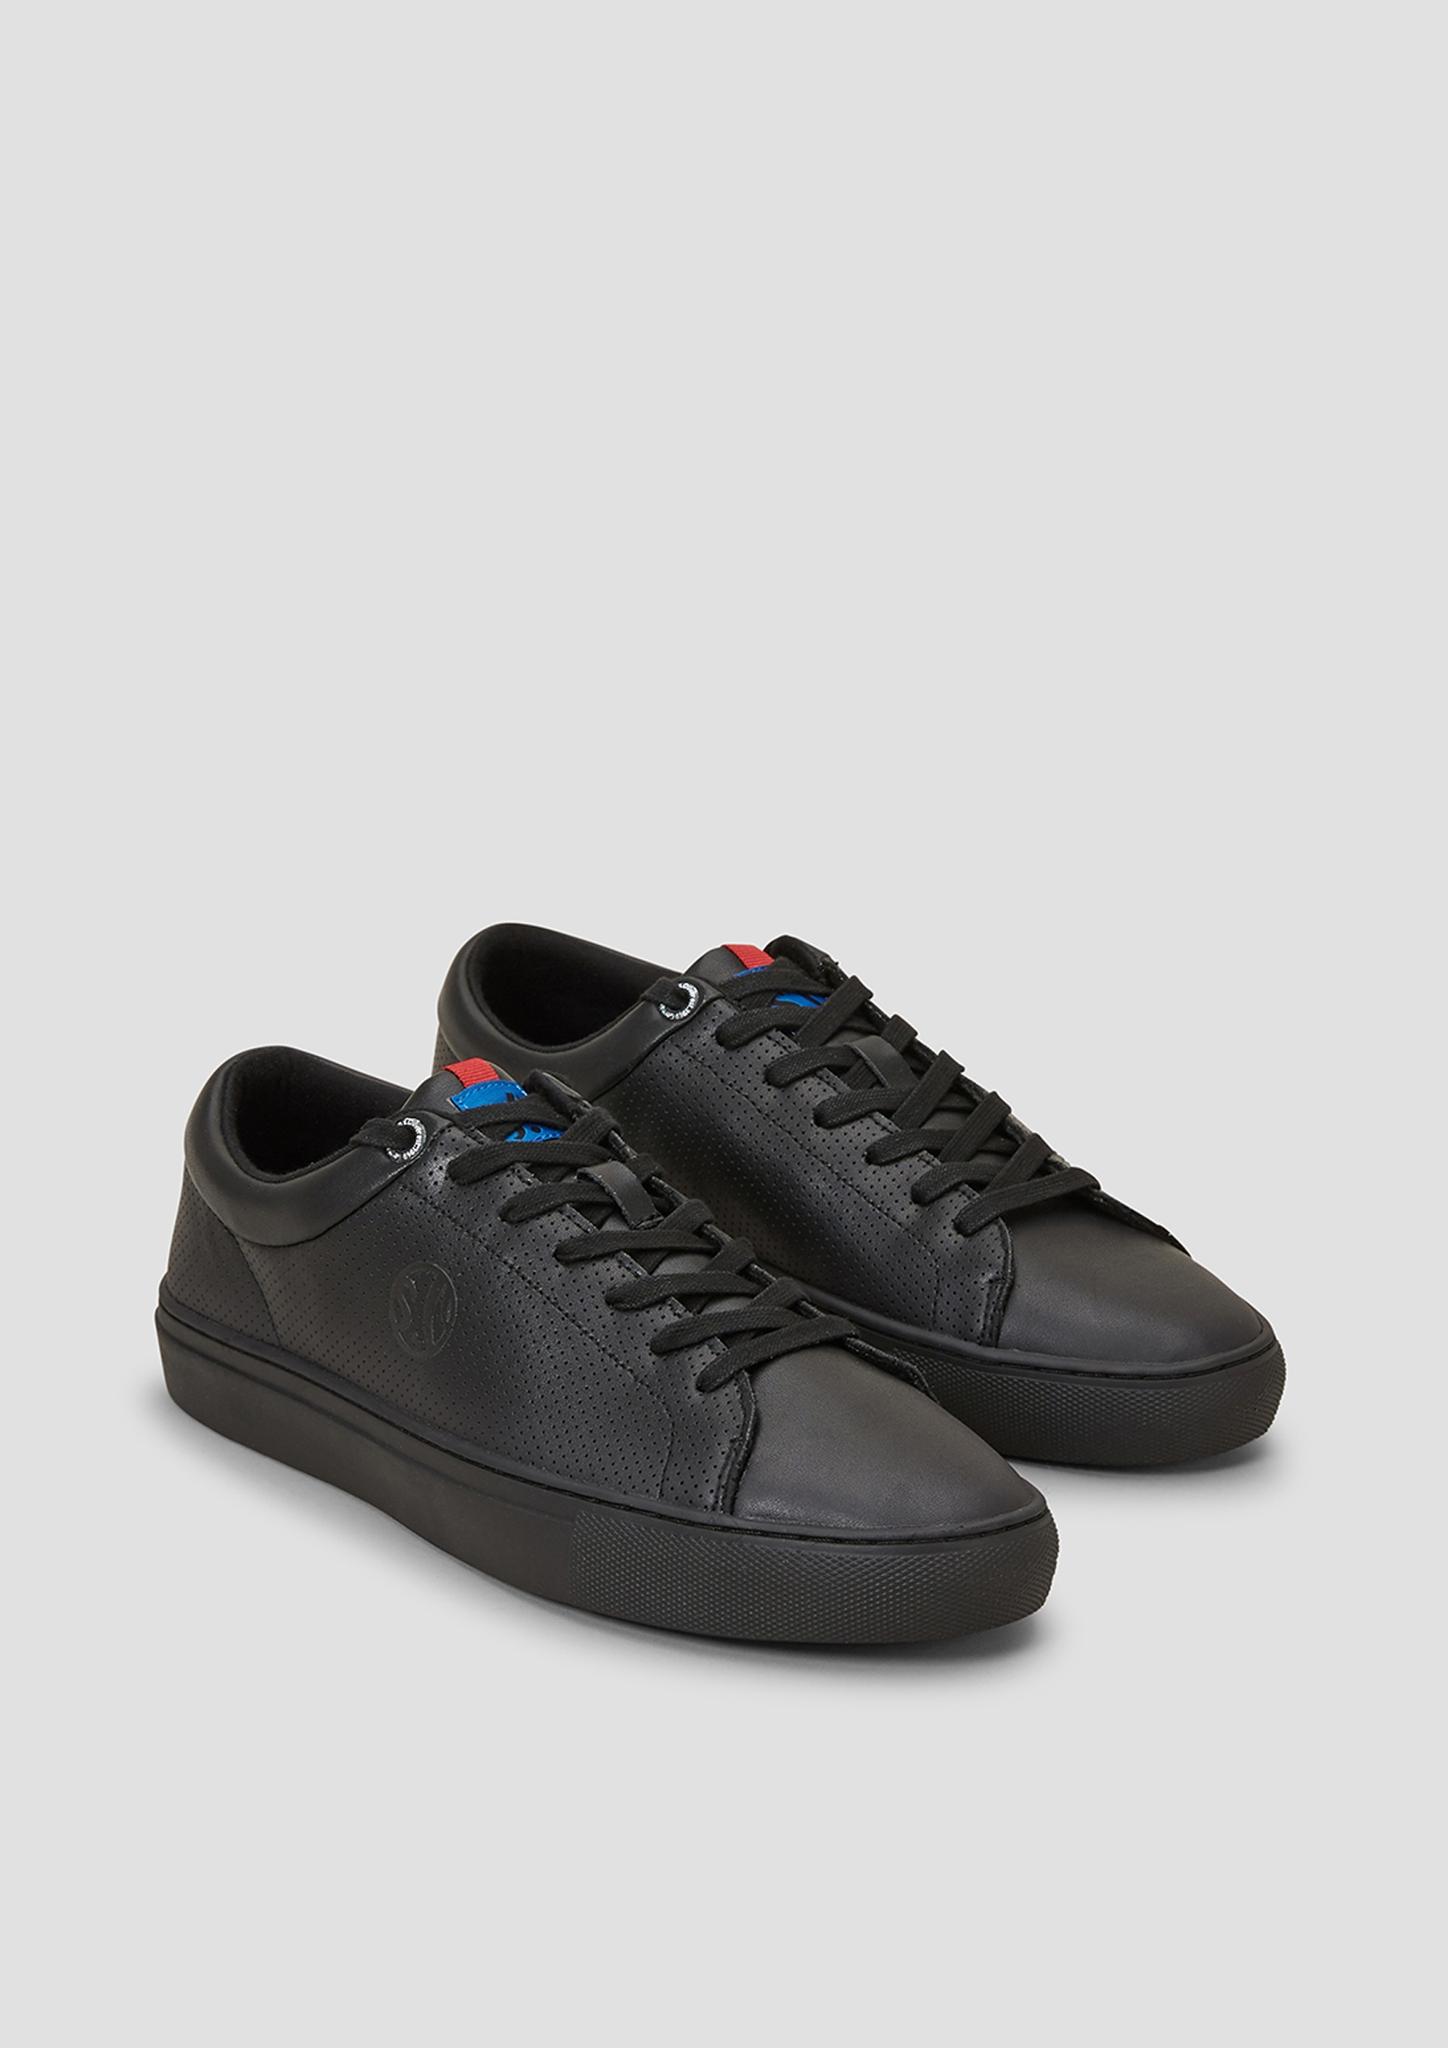 Sneakers | Schuhe > Sneaker | Schwarz | Obermaterial: leder| futter: textil| decksohle: textil| laufsohle: synthetik | s.Oliver